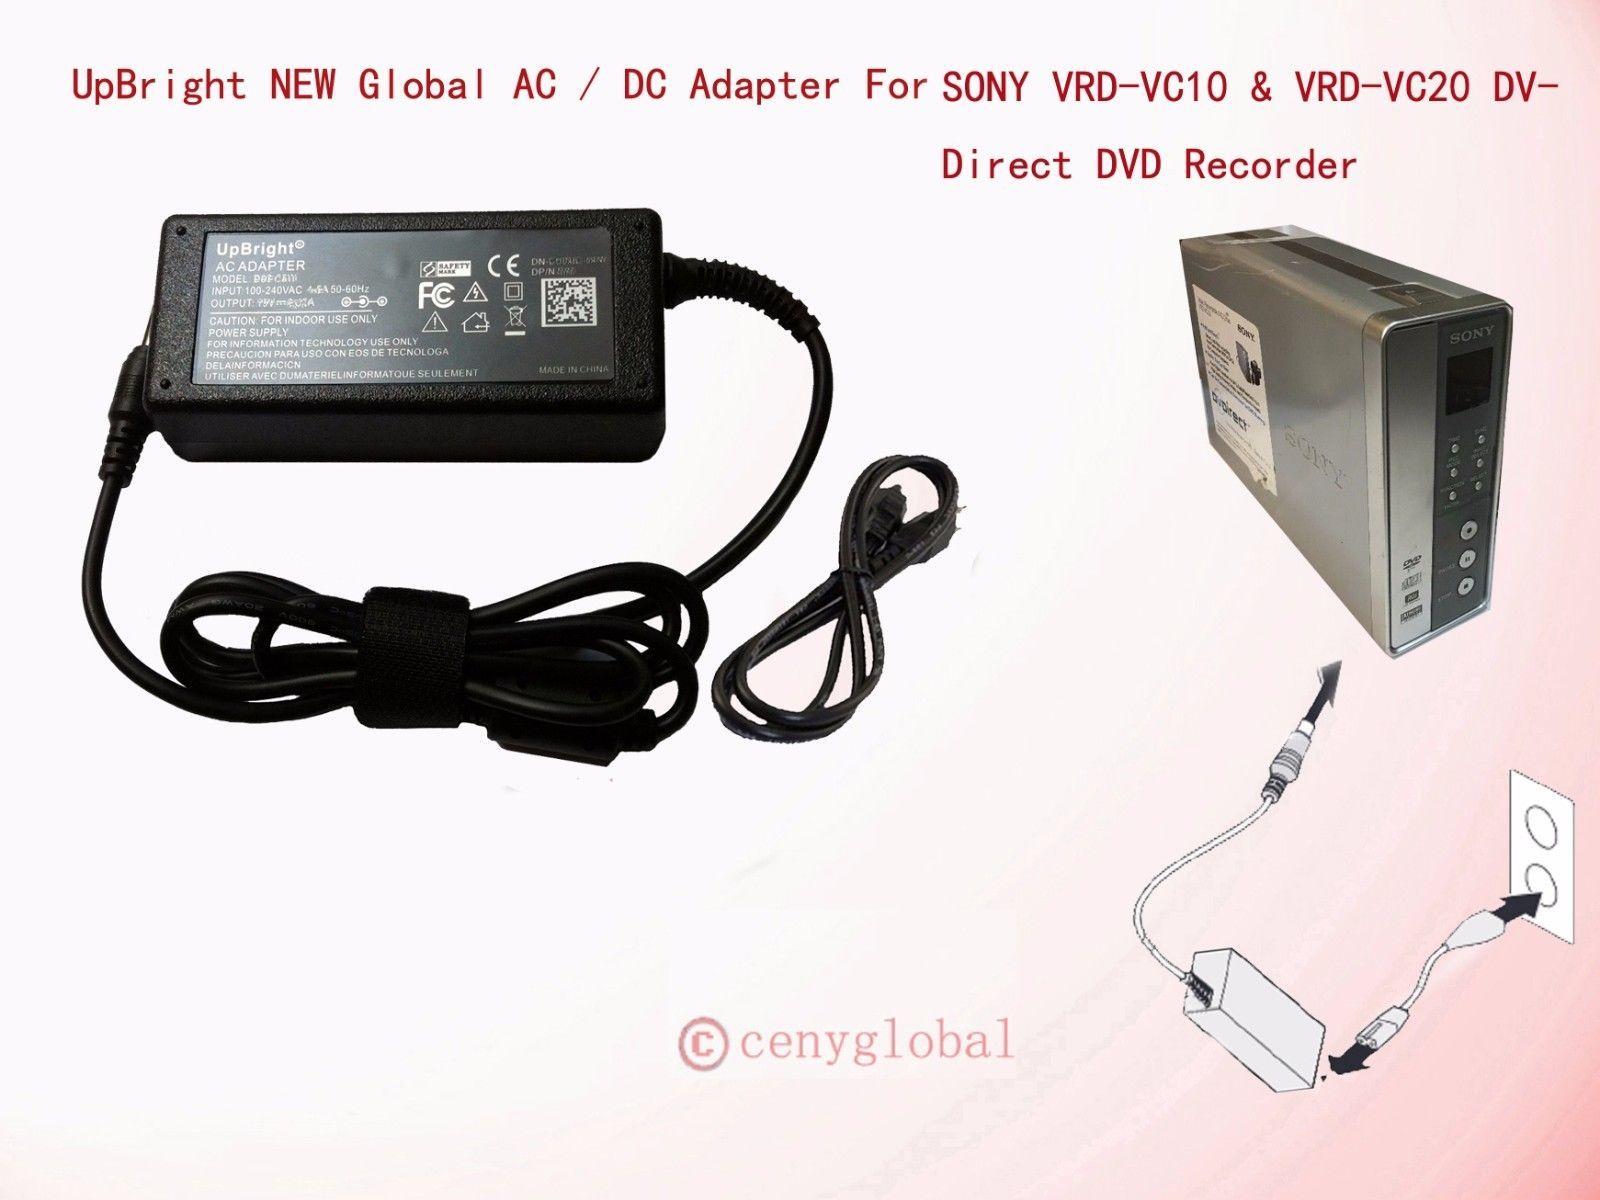 DVDIRECT VRD-VC10 WINDOWS 7 DRIVER